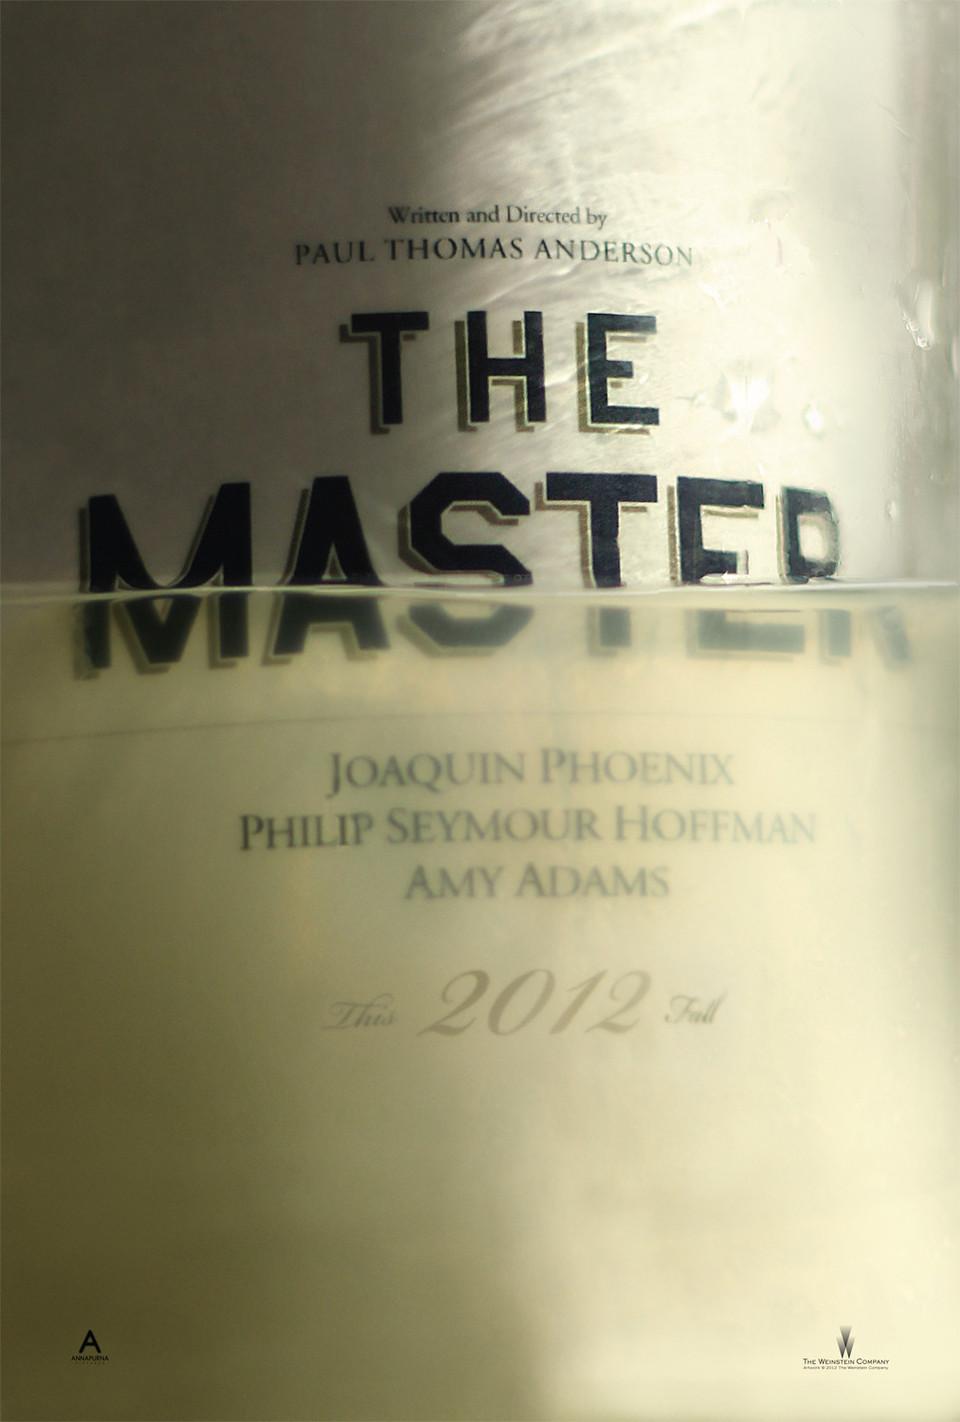 Cartel Teaser EEUU de 'The Master'